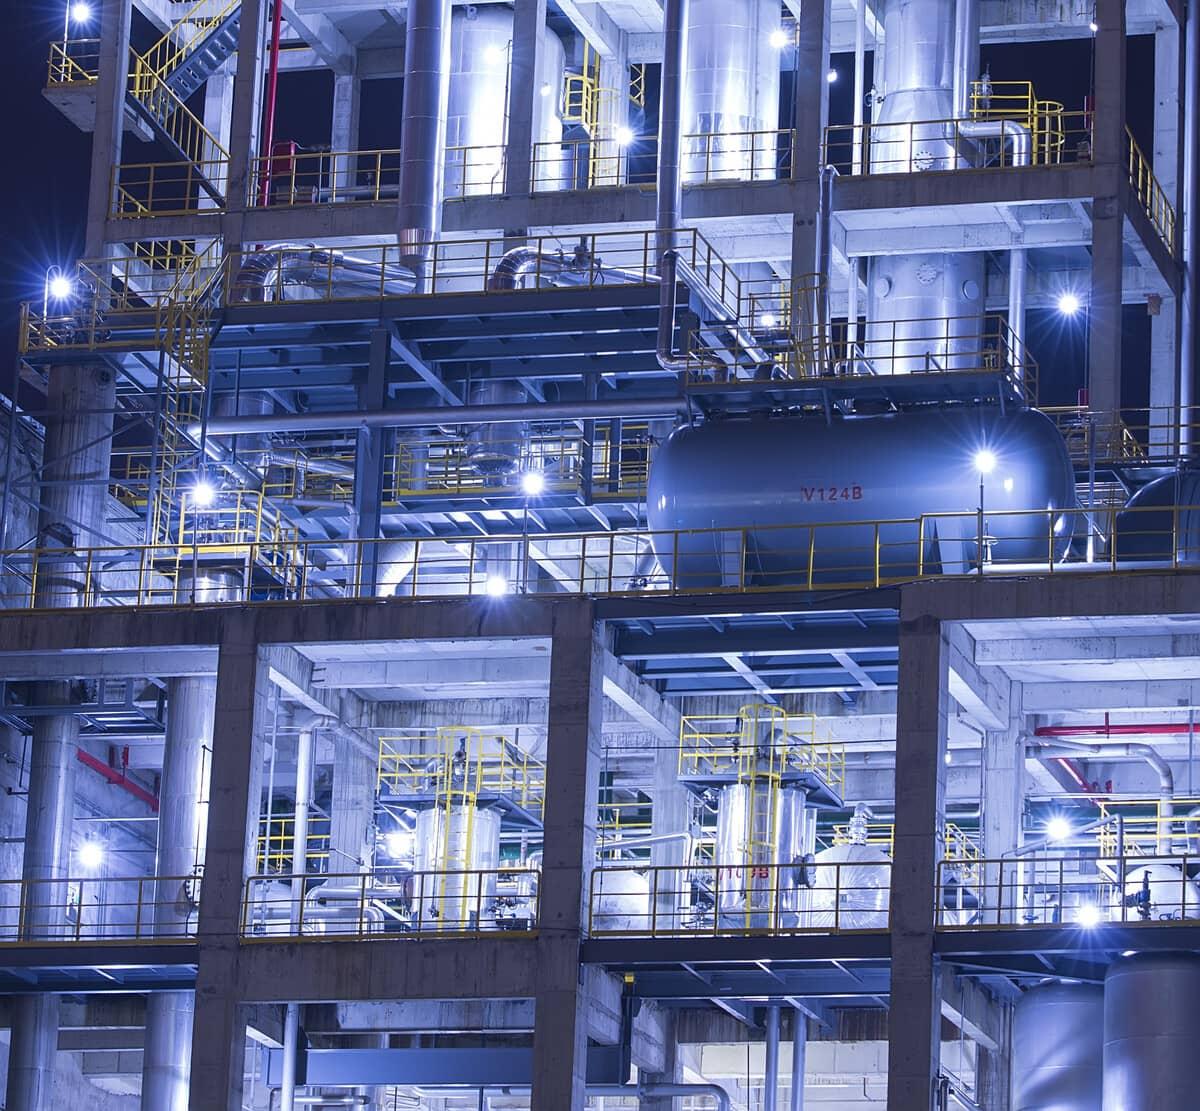 En este momento estás viendo Calderería industrial en Cantabria